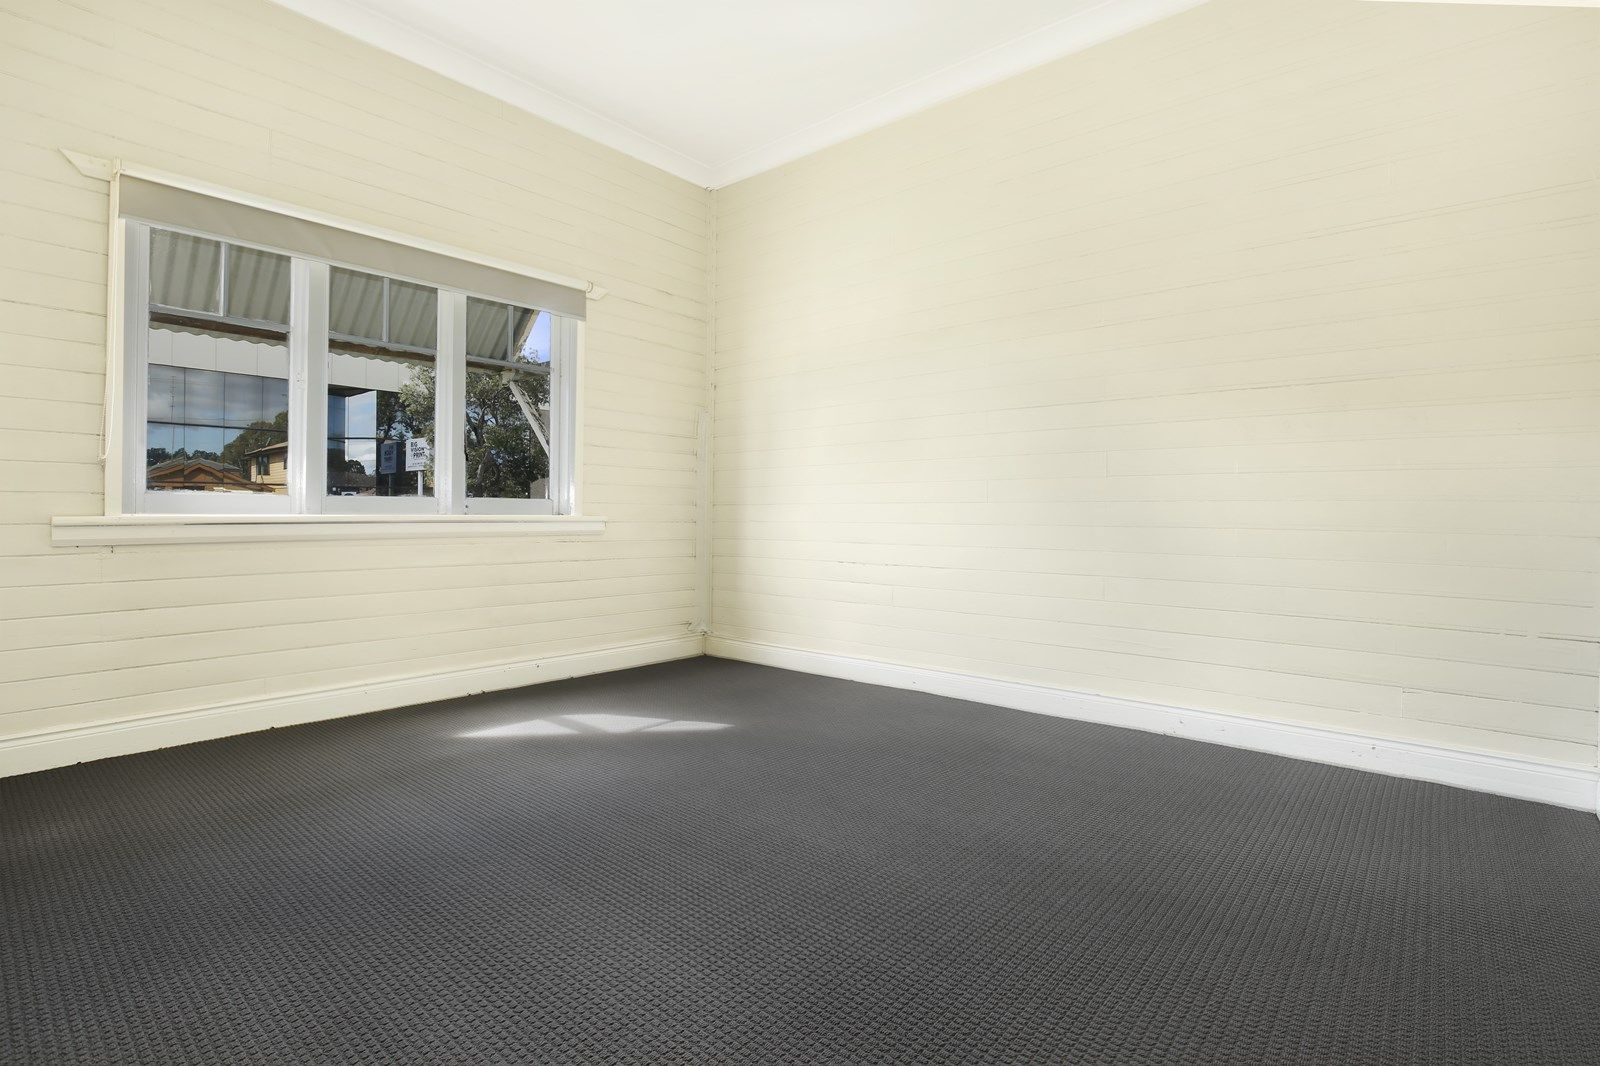 164 Kembla Street, Wollongong NSW 2500, Image 1